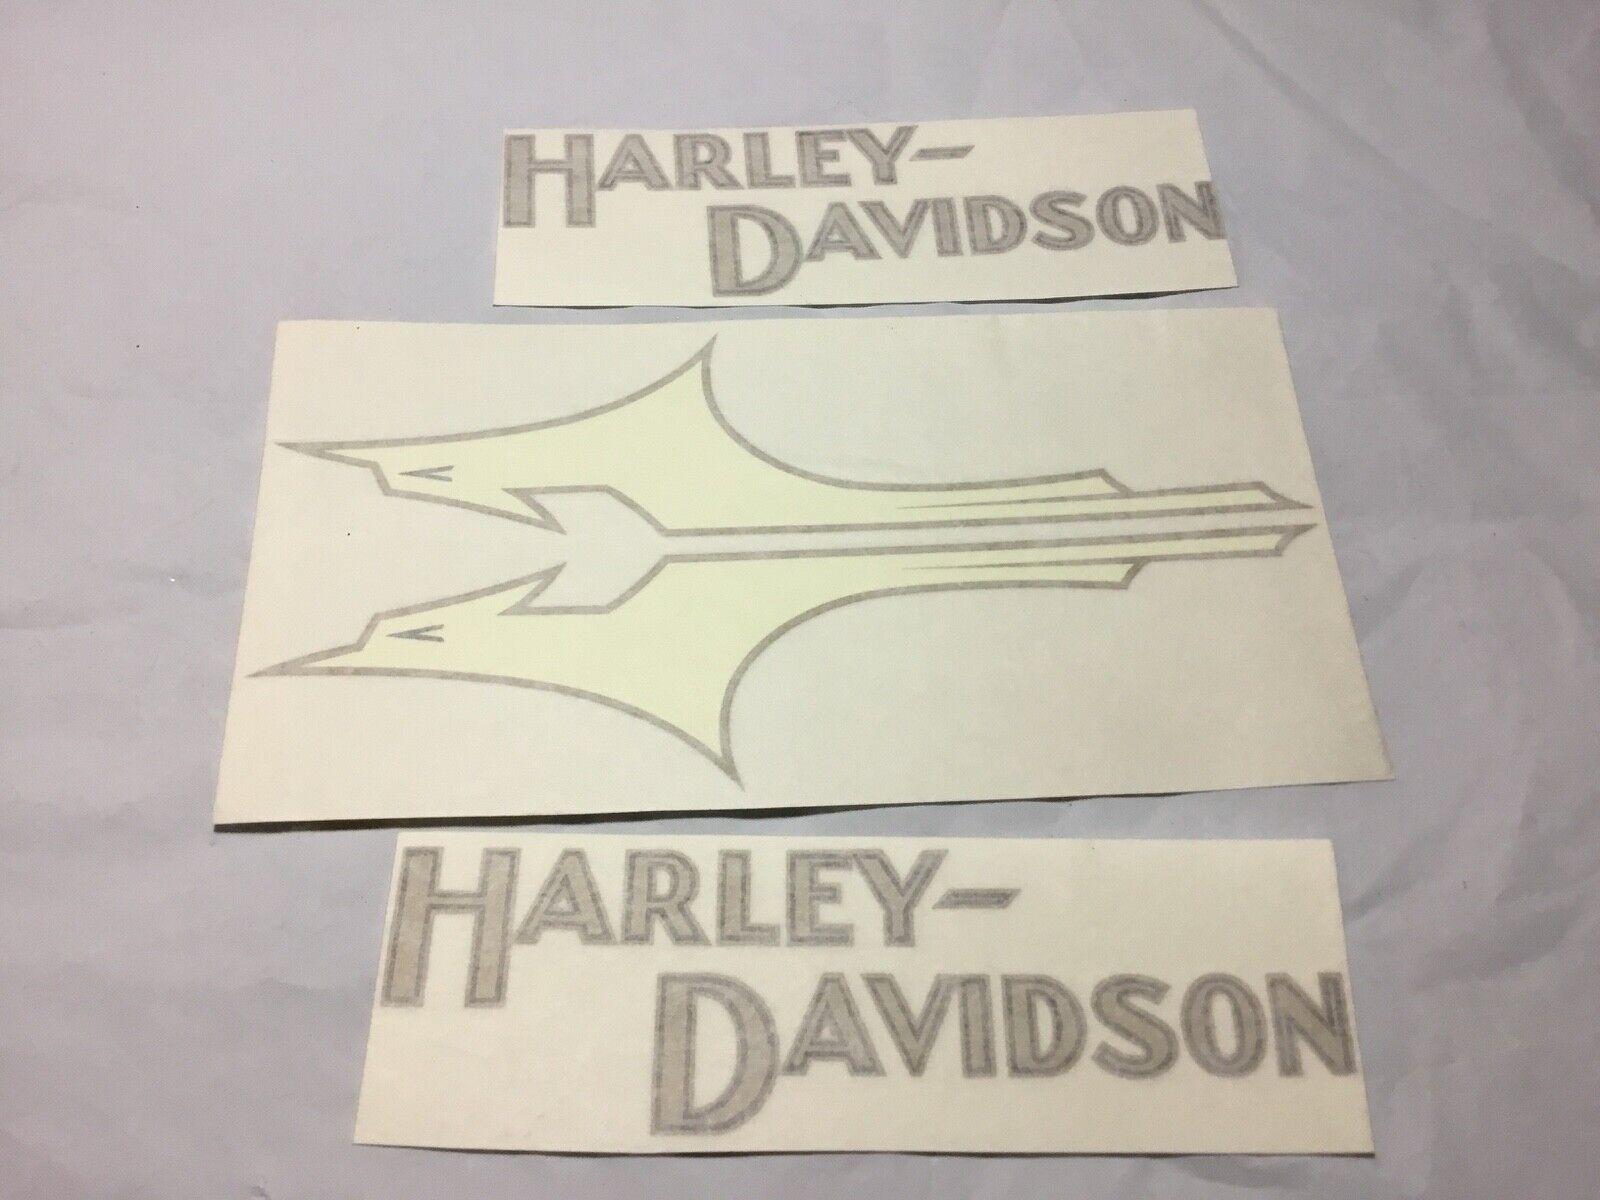 Harley Davidson Fxstc Softail Decals Gold Black Set Of 2 Fuel